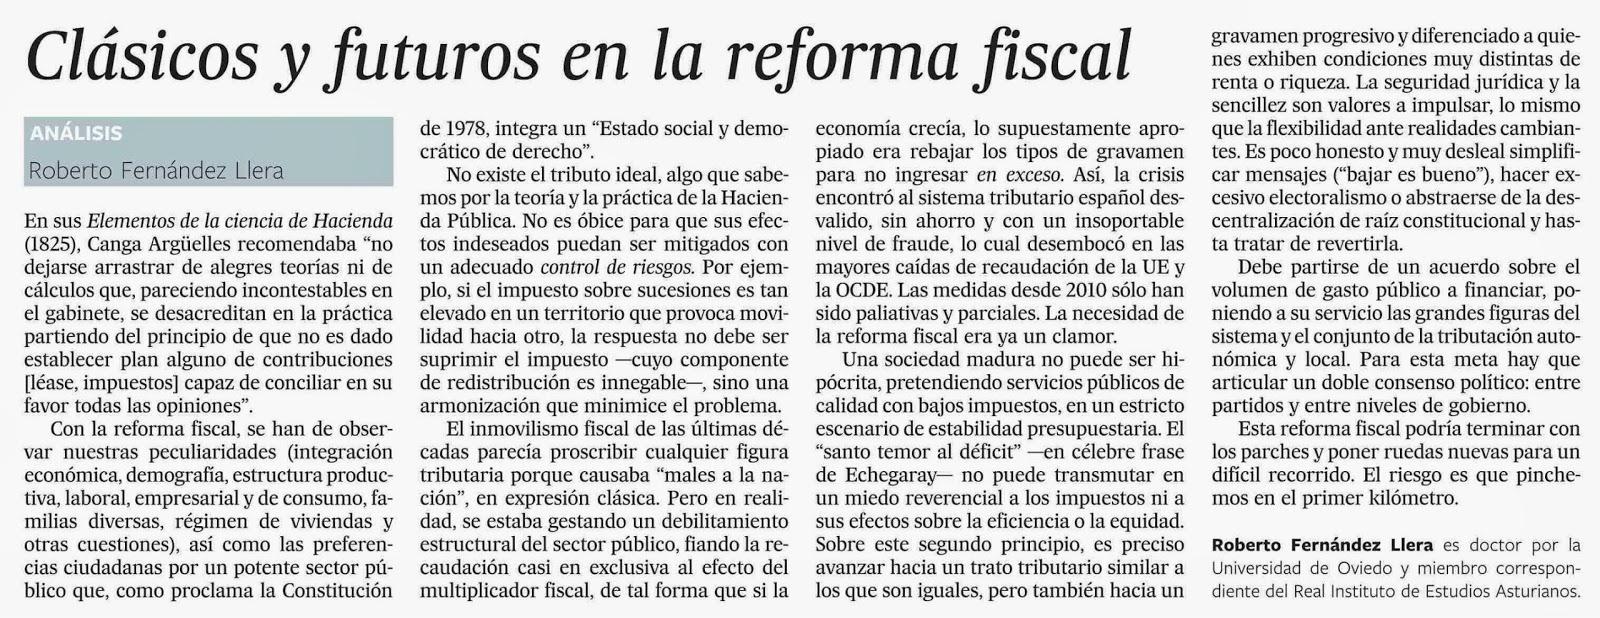 http://economia.elpais.com/economia/2014/06/21/actualidad/1403369690_795237.html